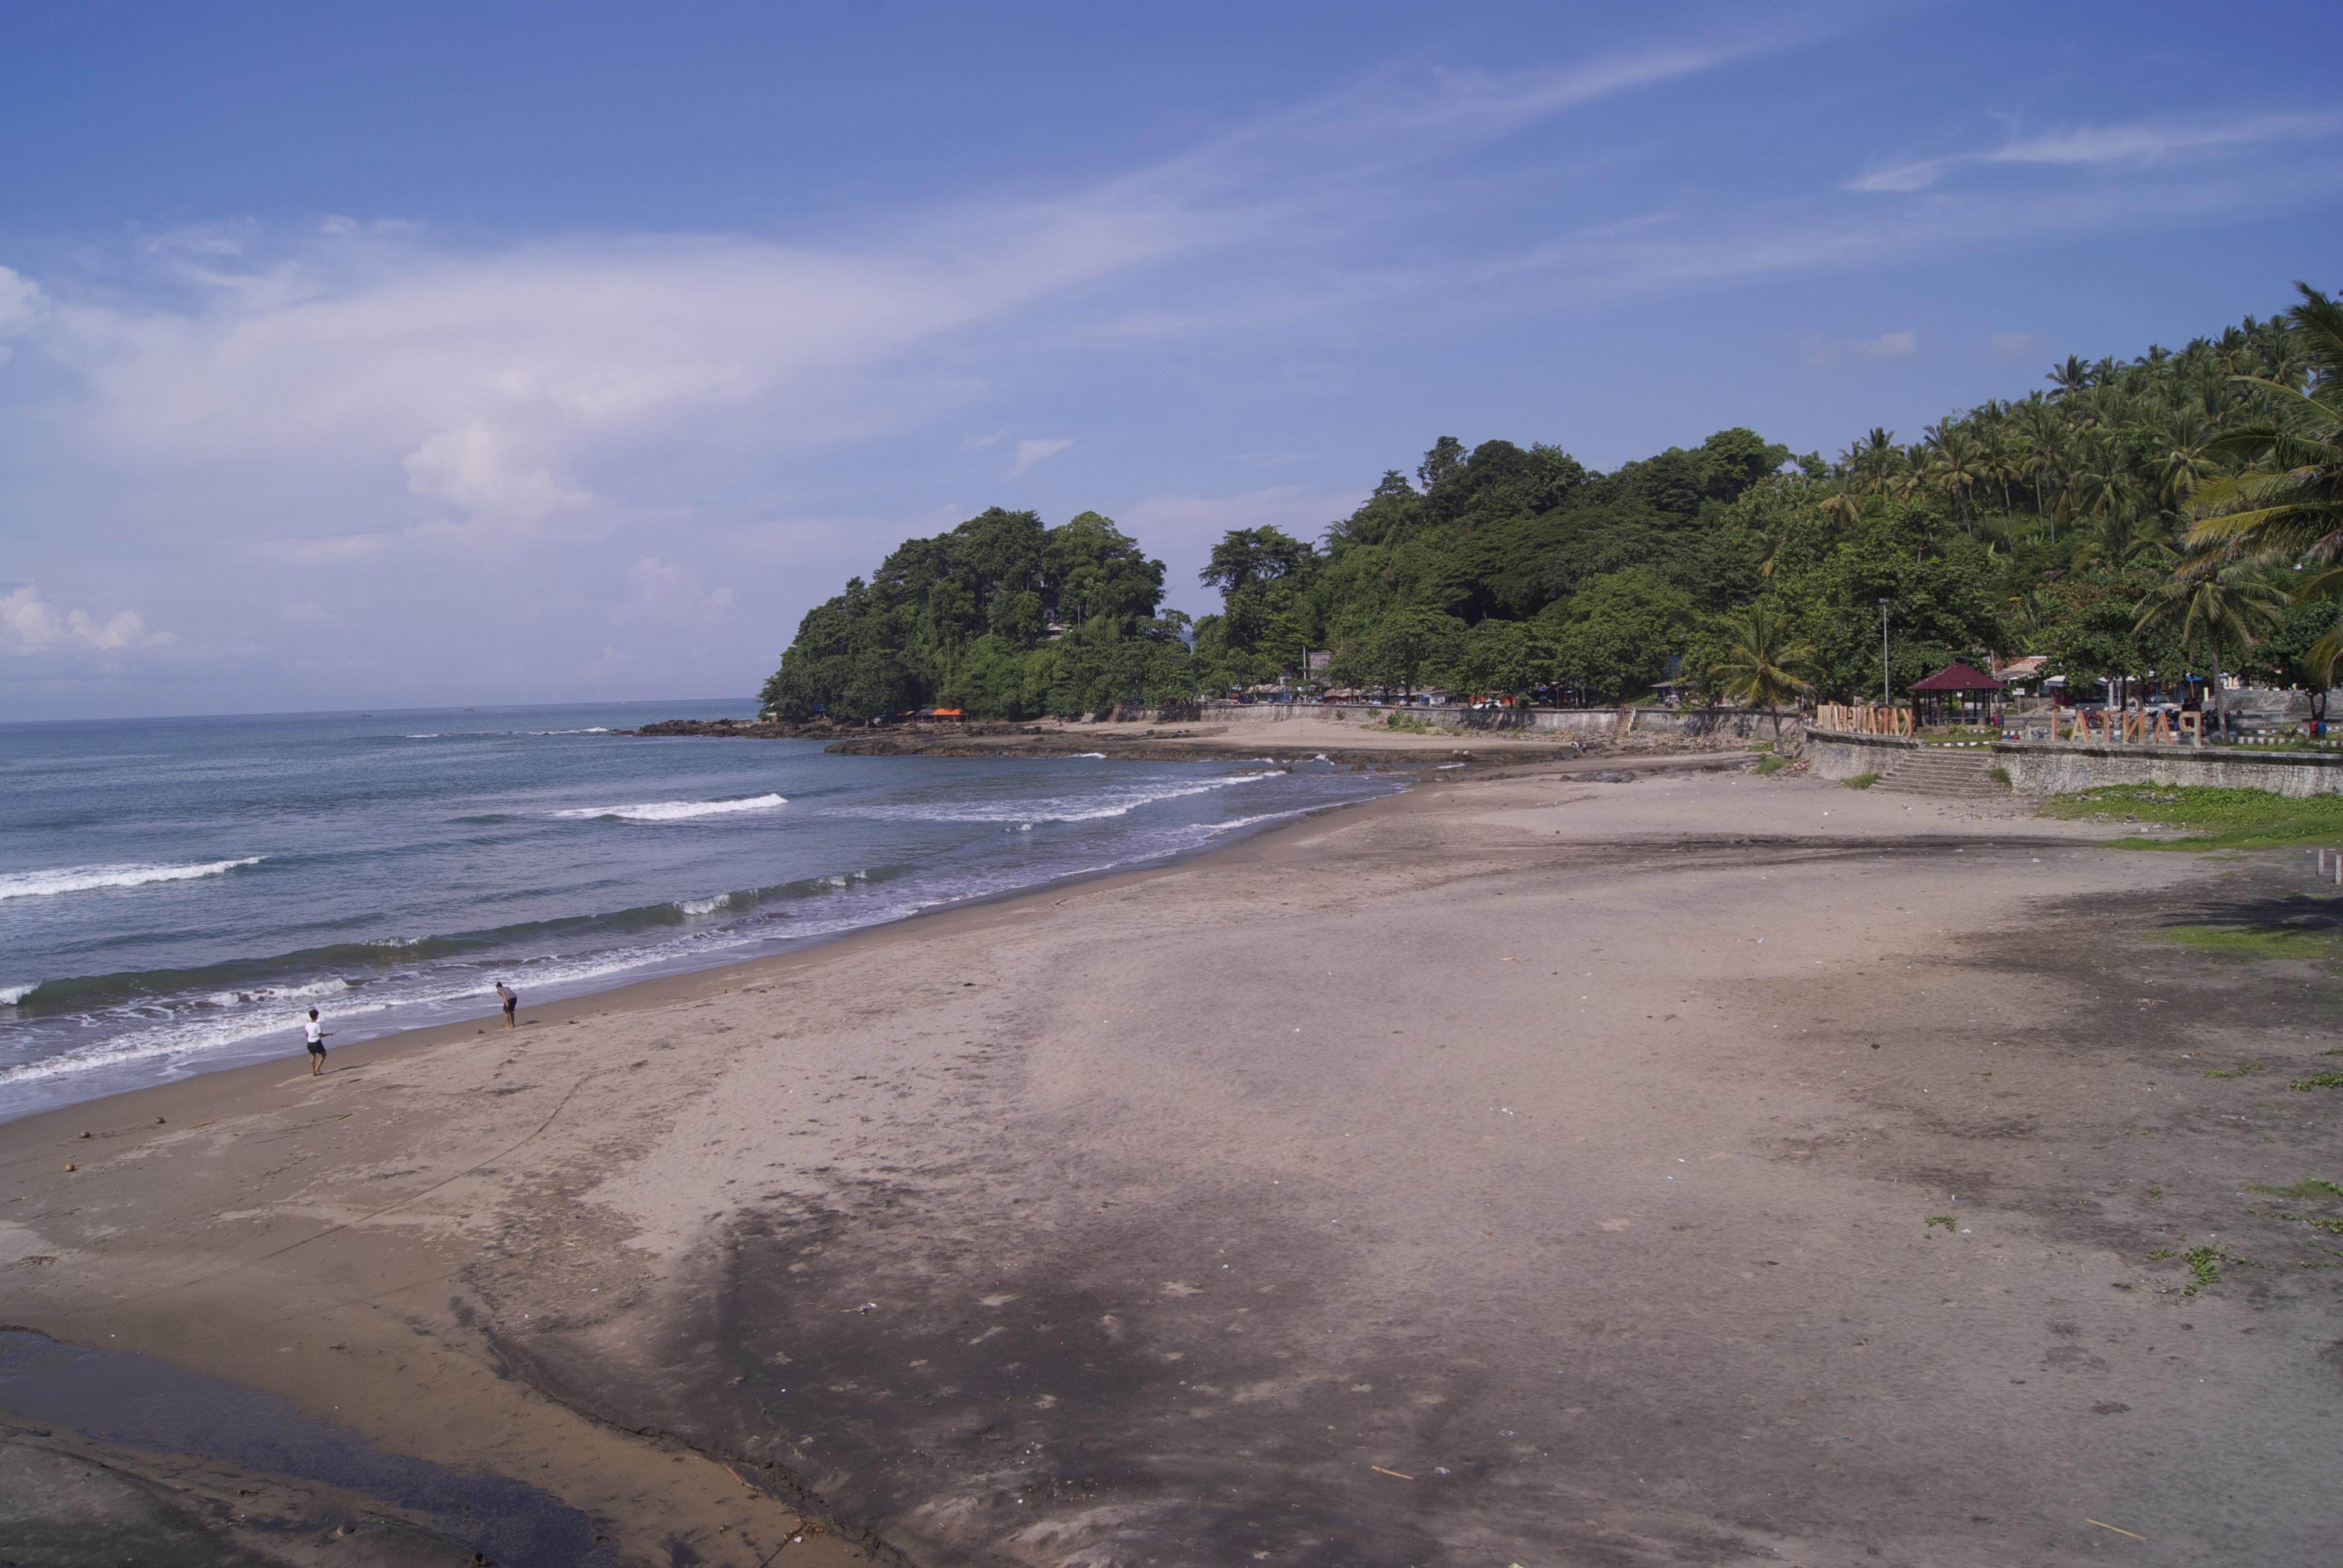 Pantai Karang Hawu - Wikipedia bahasa Indonesia, ensiklopedia bebas